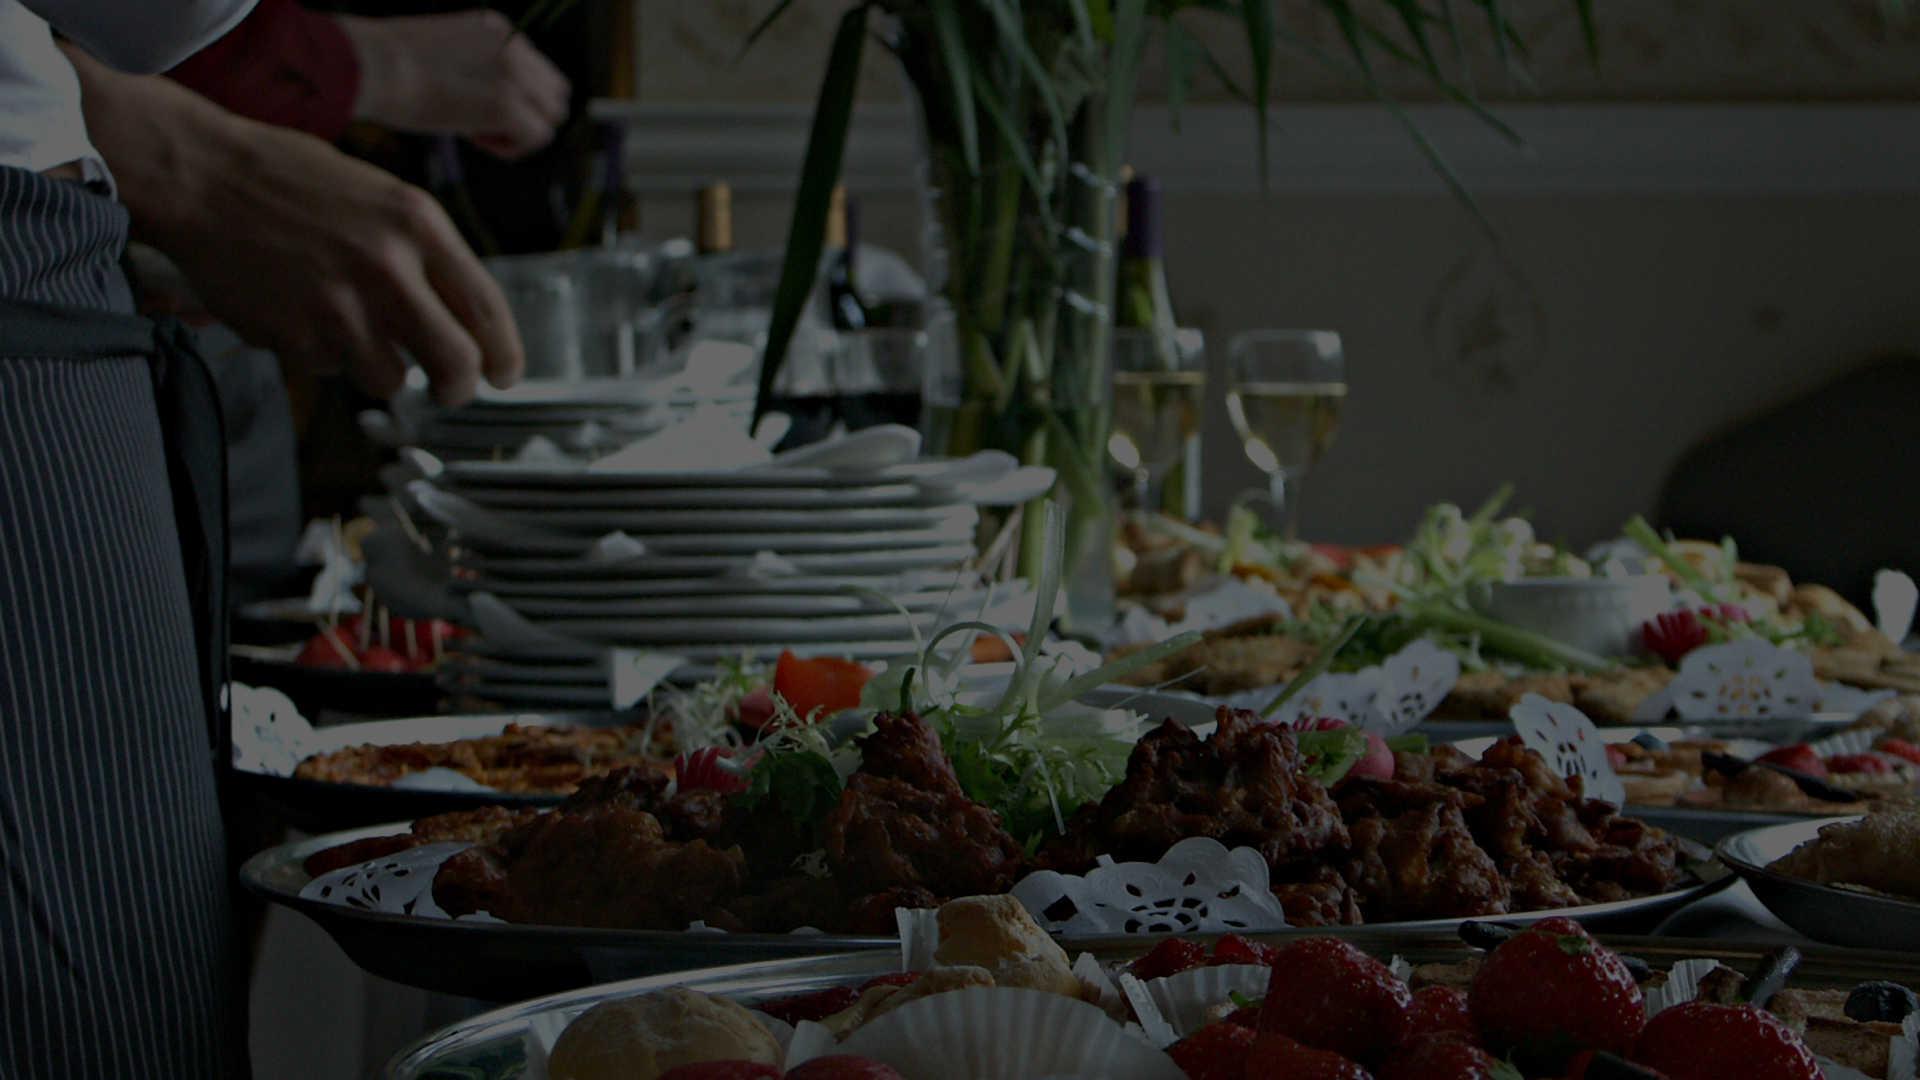 culinaria-partyservice-augsburg-02